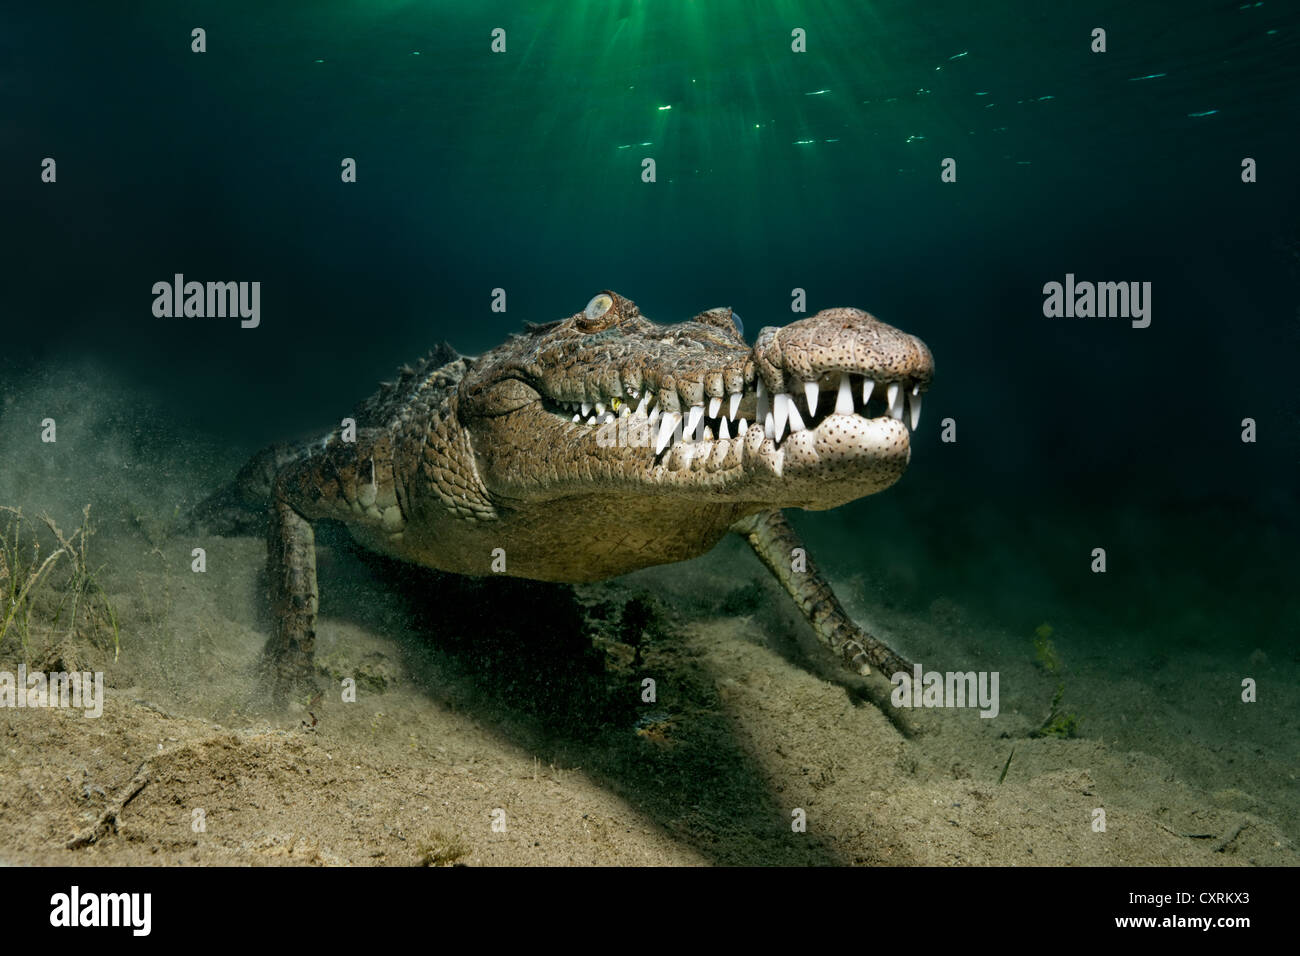 Saltwater Crocodile or Estuarine Crocodile or Indo-Pacific Crocodile (Crocodylus porosus), underwater, head-on - Stock Image